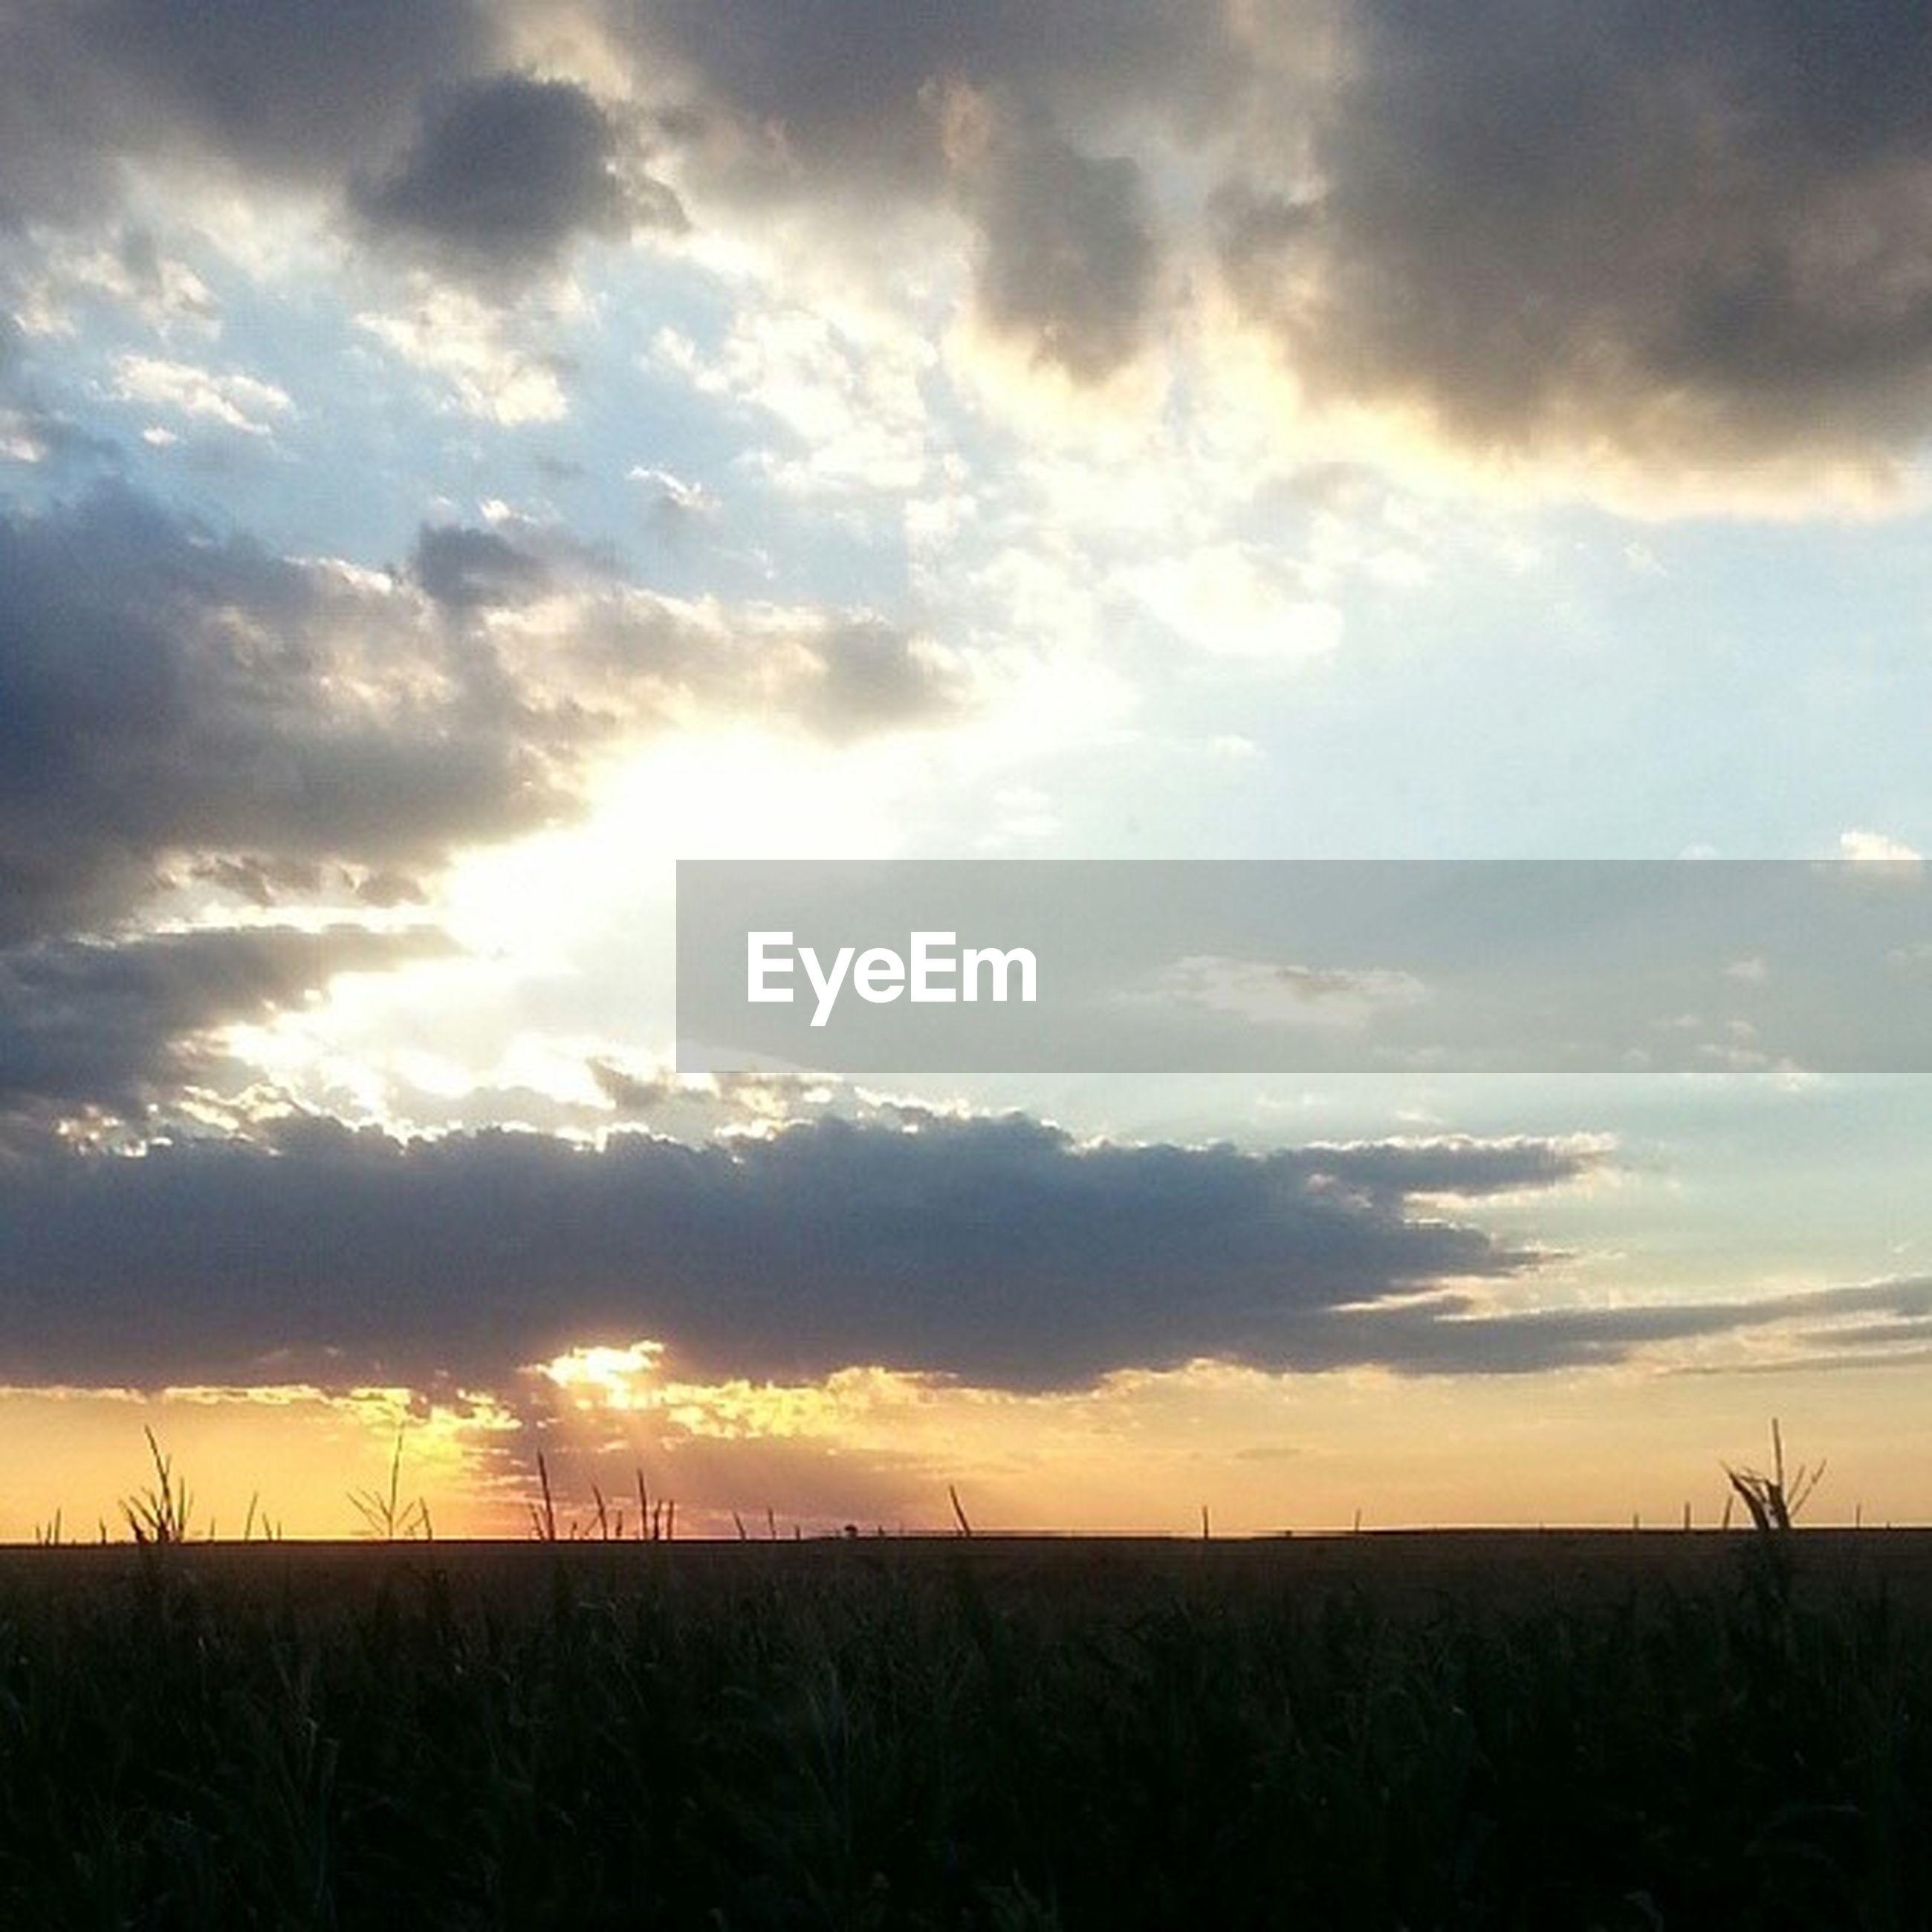 sunset, sky, tranquil scene, tranquility, scenics, landscape, beauty in nature, field, cloud - sky, nature, silhouette, idyllic, rural scene, cloud, cloudy, horizon over land, orange color, dramatic sky, agriculture, sun